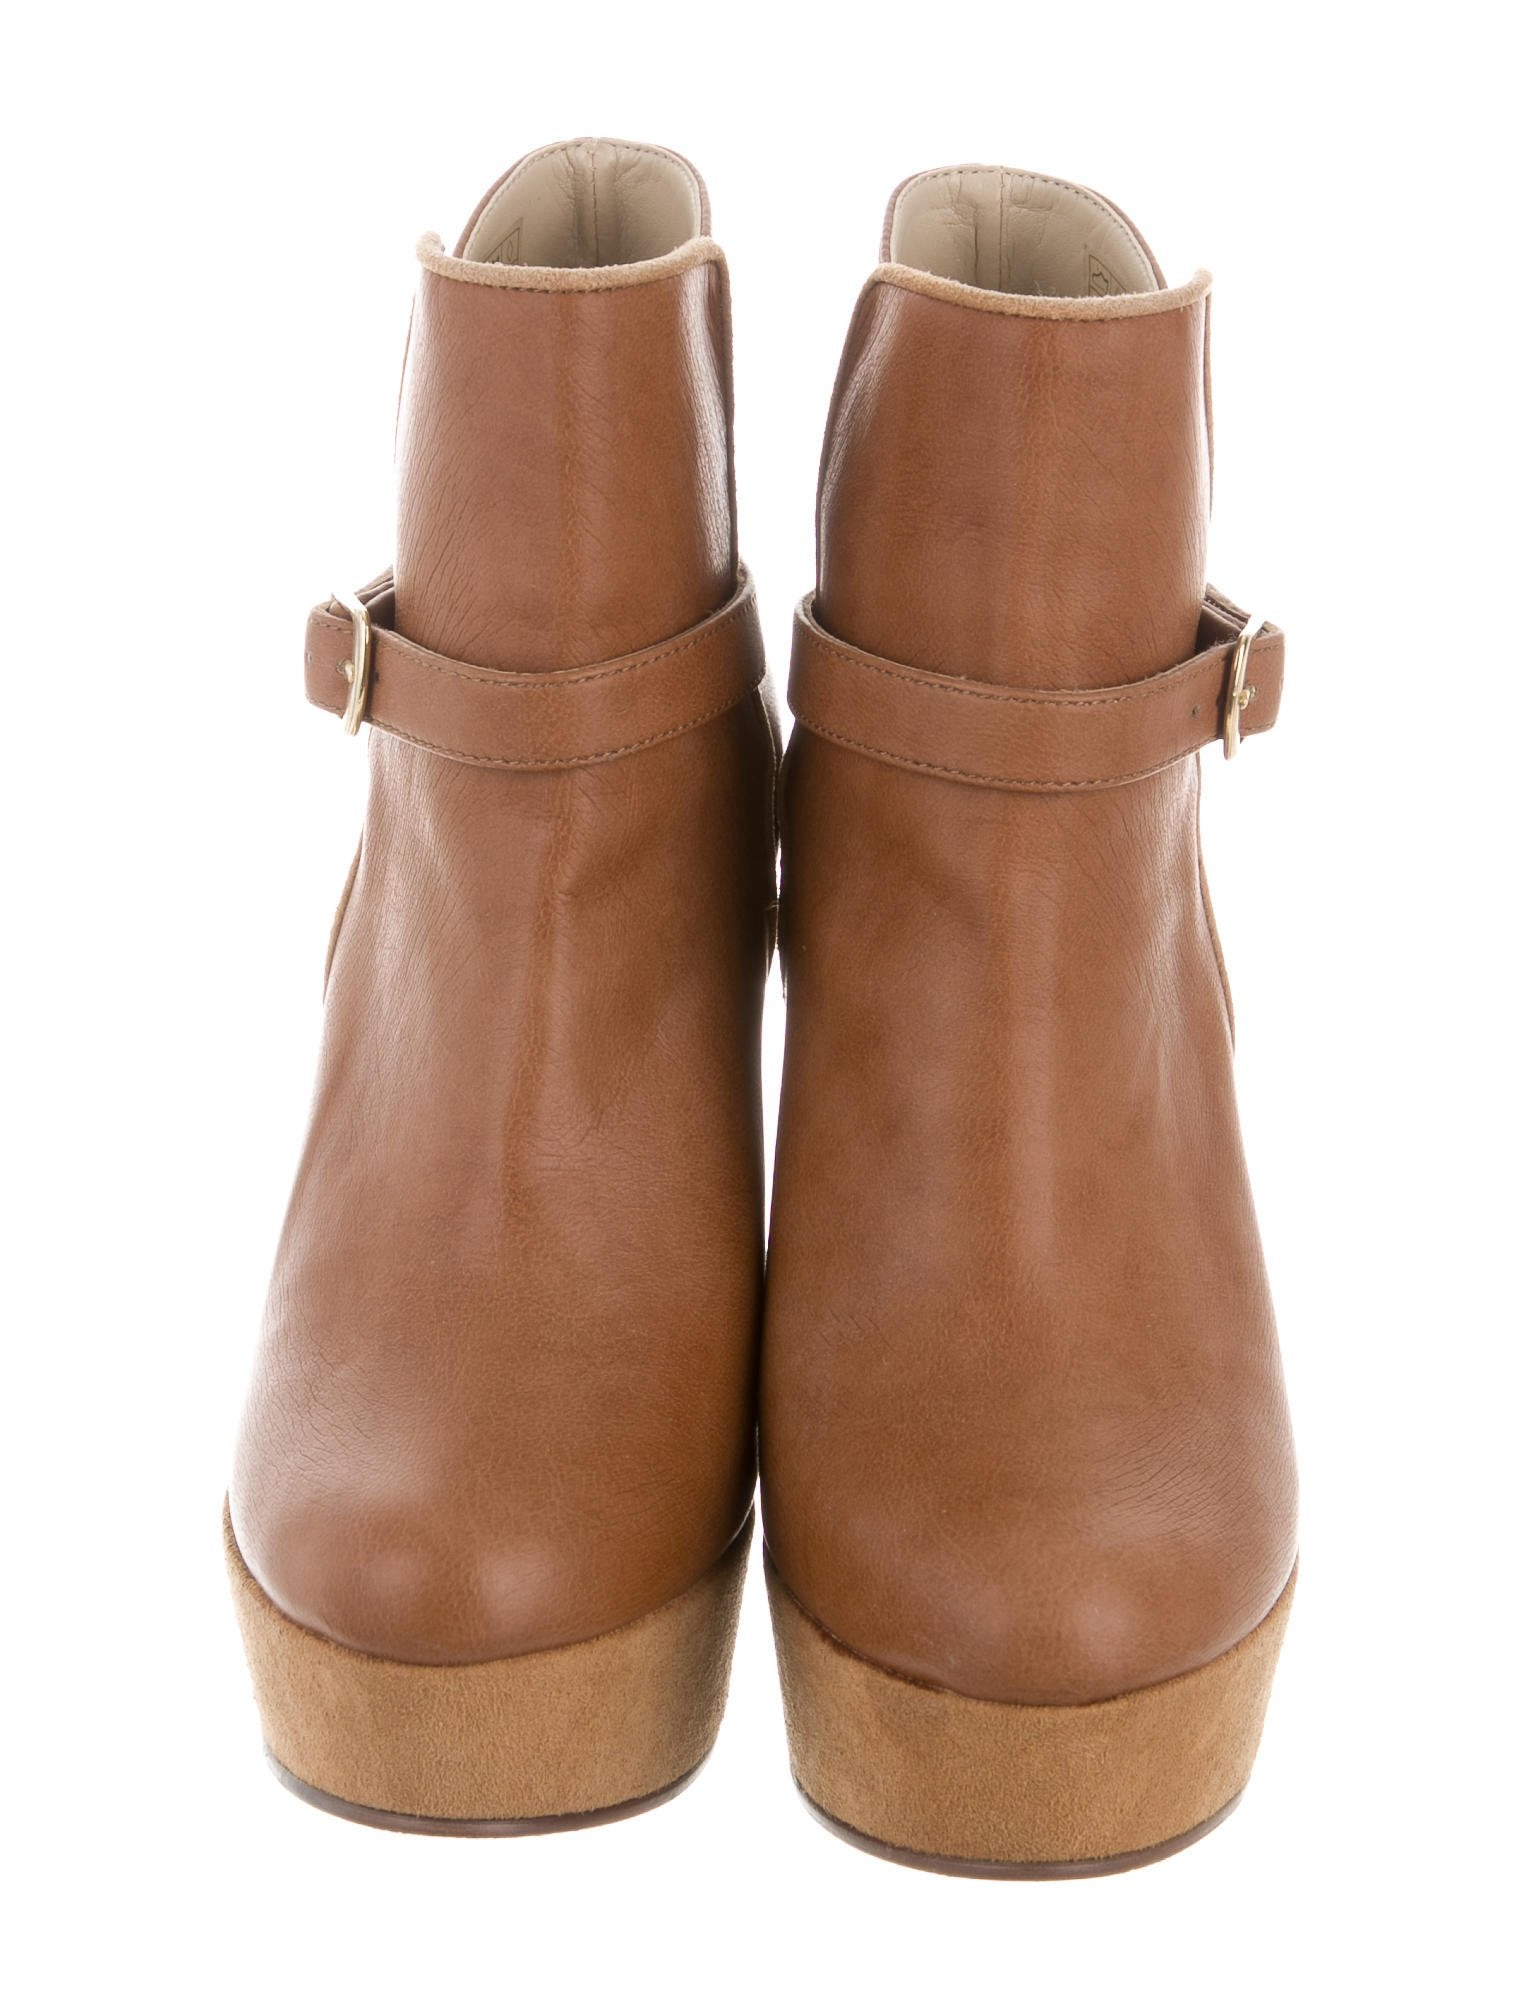 stella mccartney vegan leather boots shoes stl50434